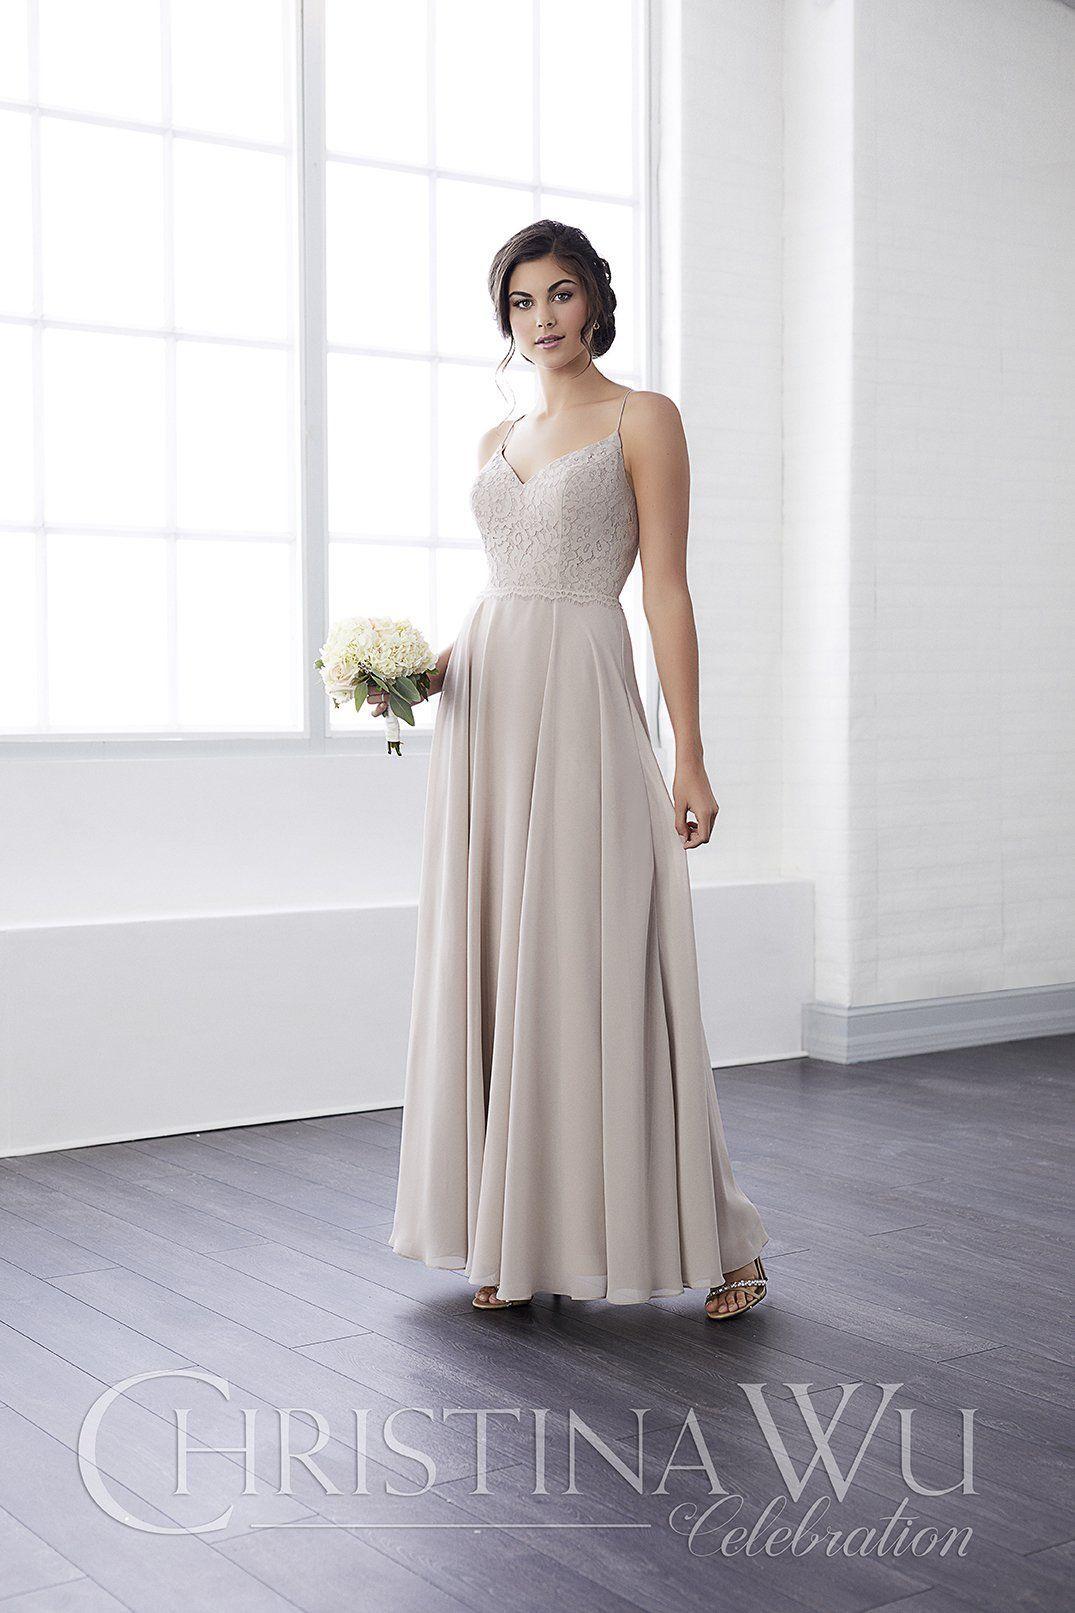 Chiffon wedding dress empire waist  The skirtus long chiffon stream spills out of the empire waistline